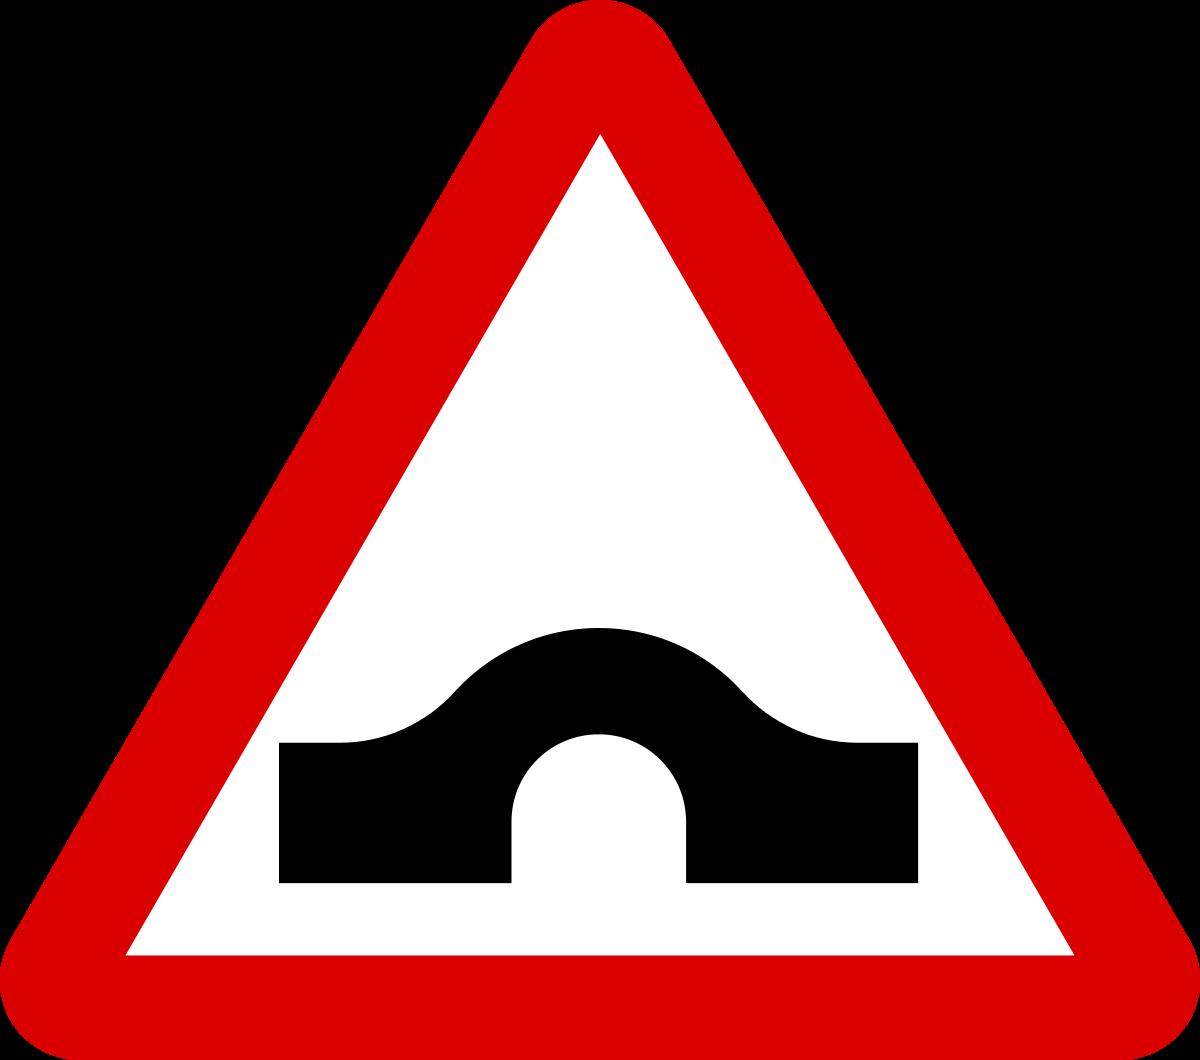 Fichier:Mauritius Road Signs - Warning Sign - Hump Bridge.svg ...